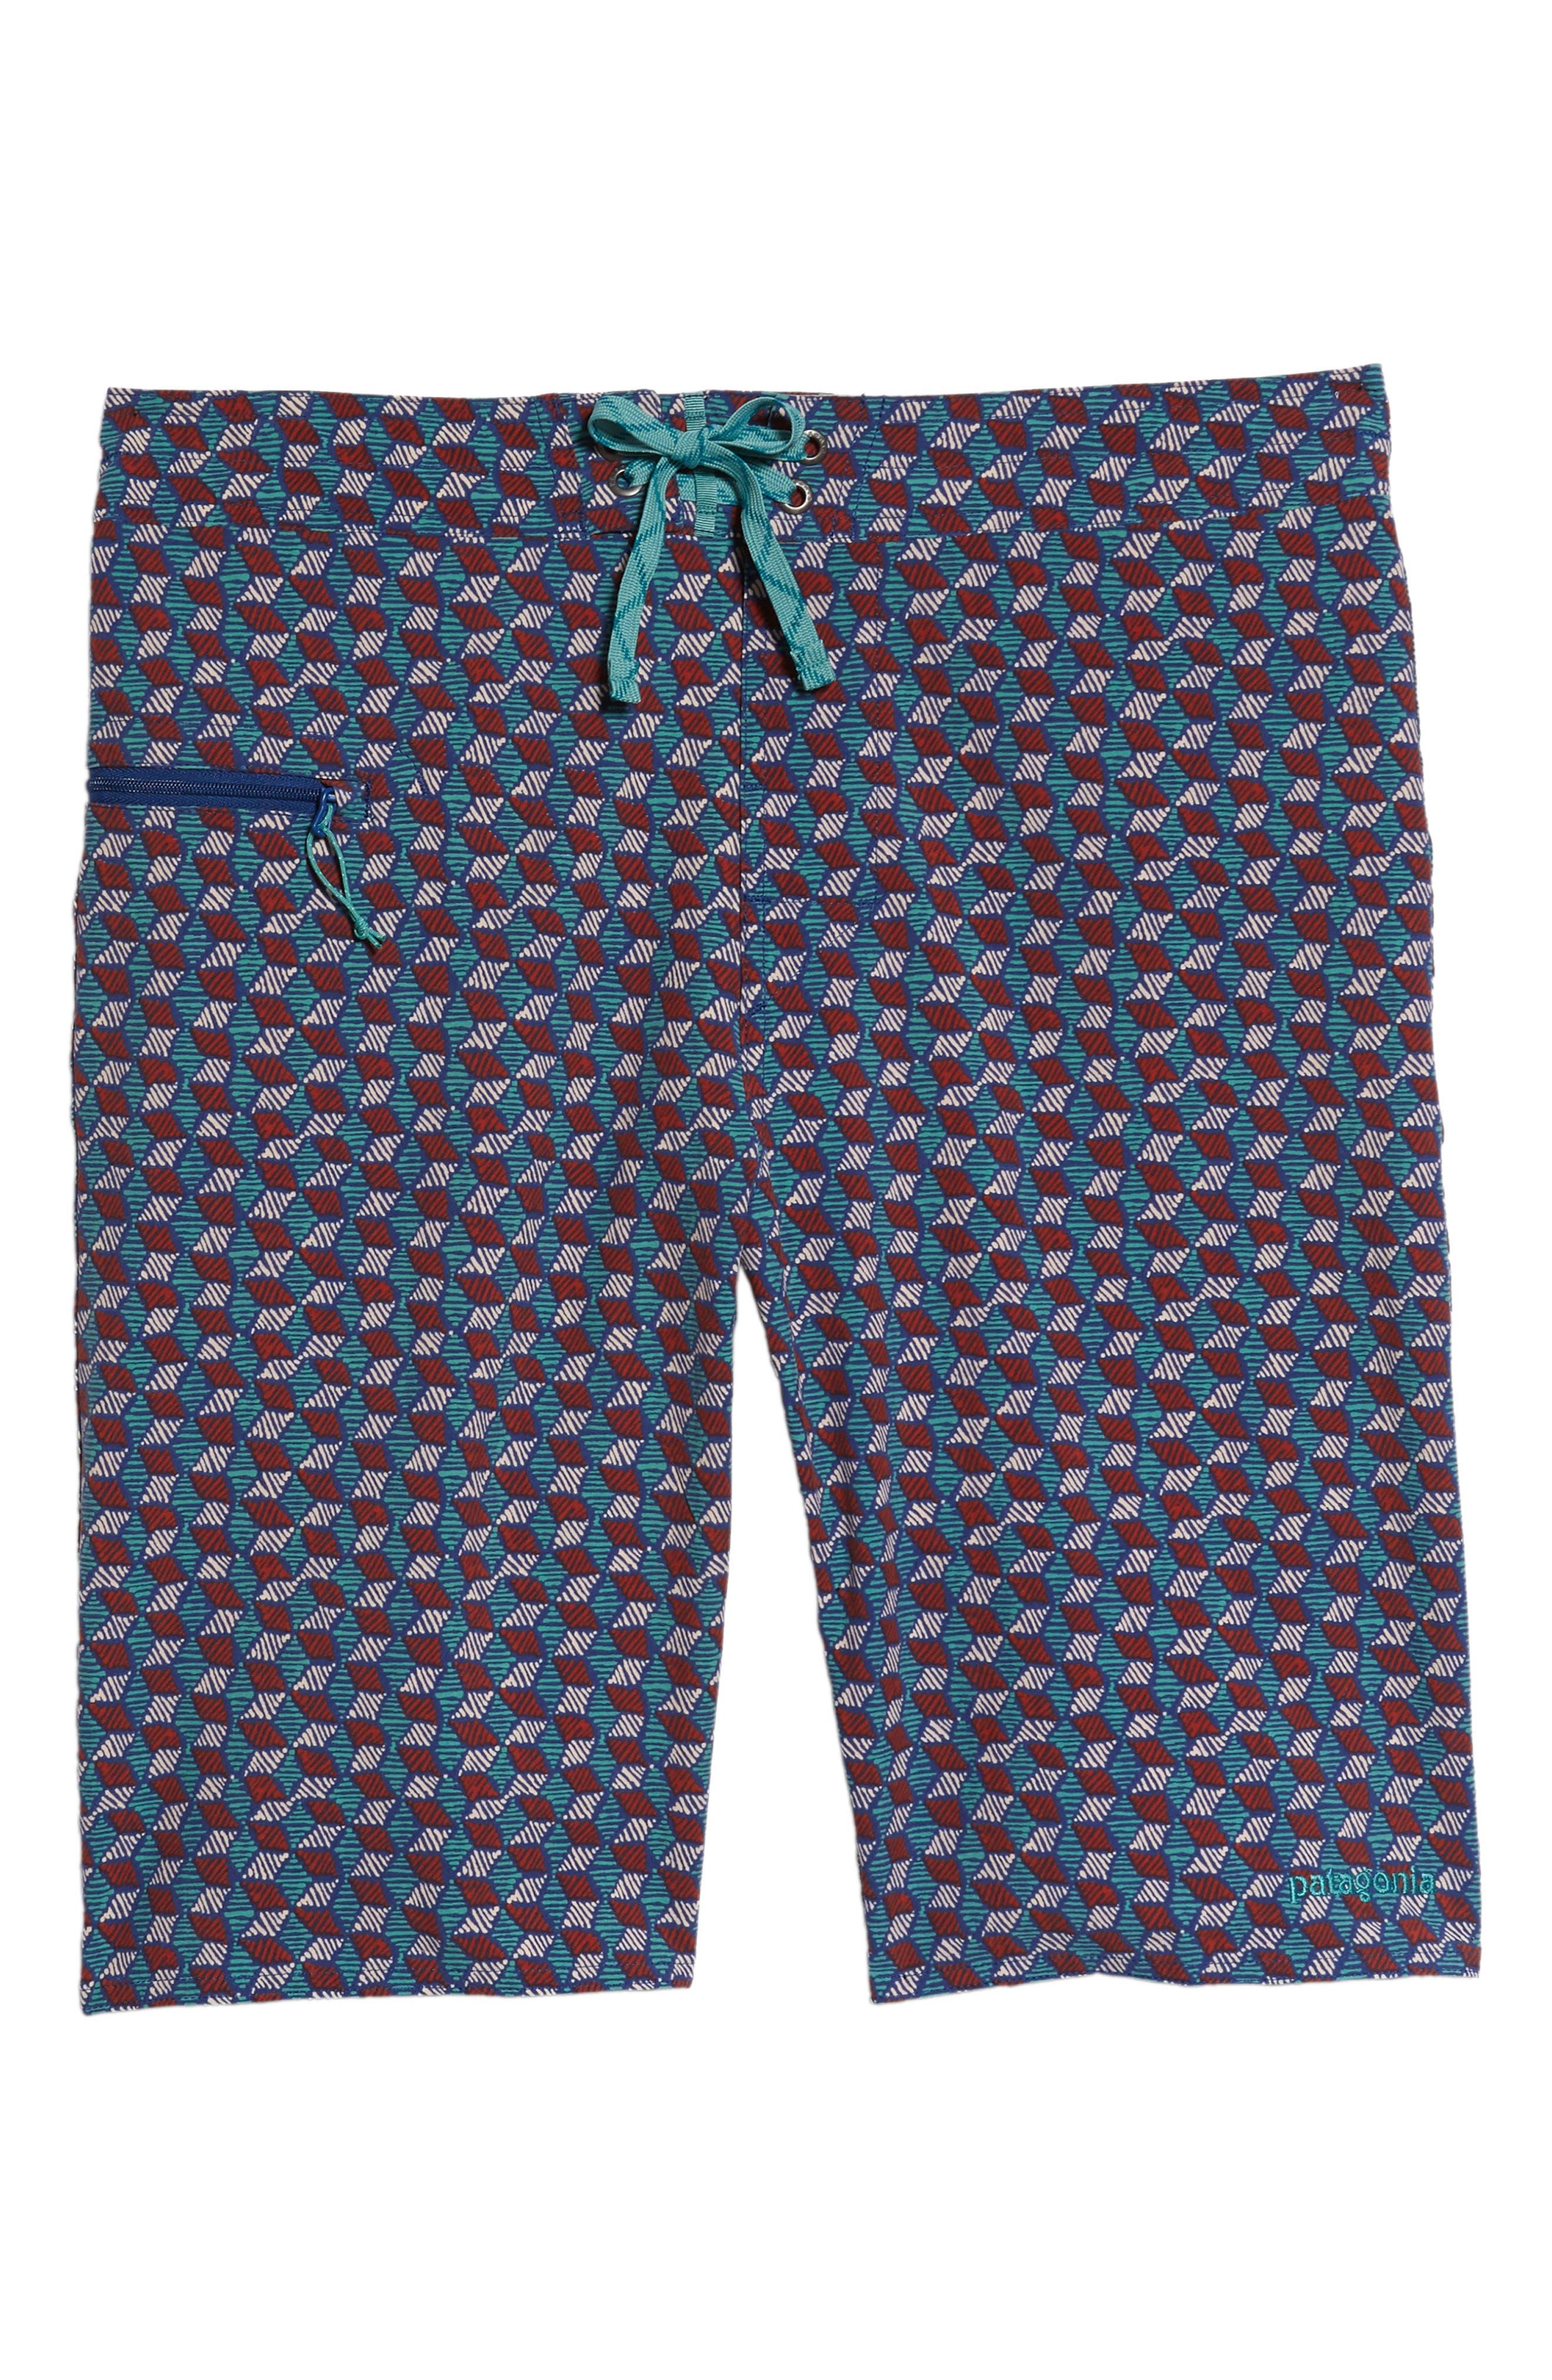 Wavefarer Board Shorts,                             Alternate thumbnail 6, color,                             Superior Blue